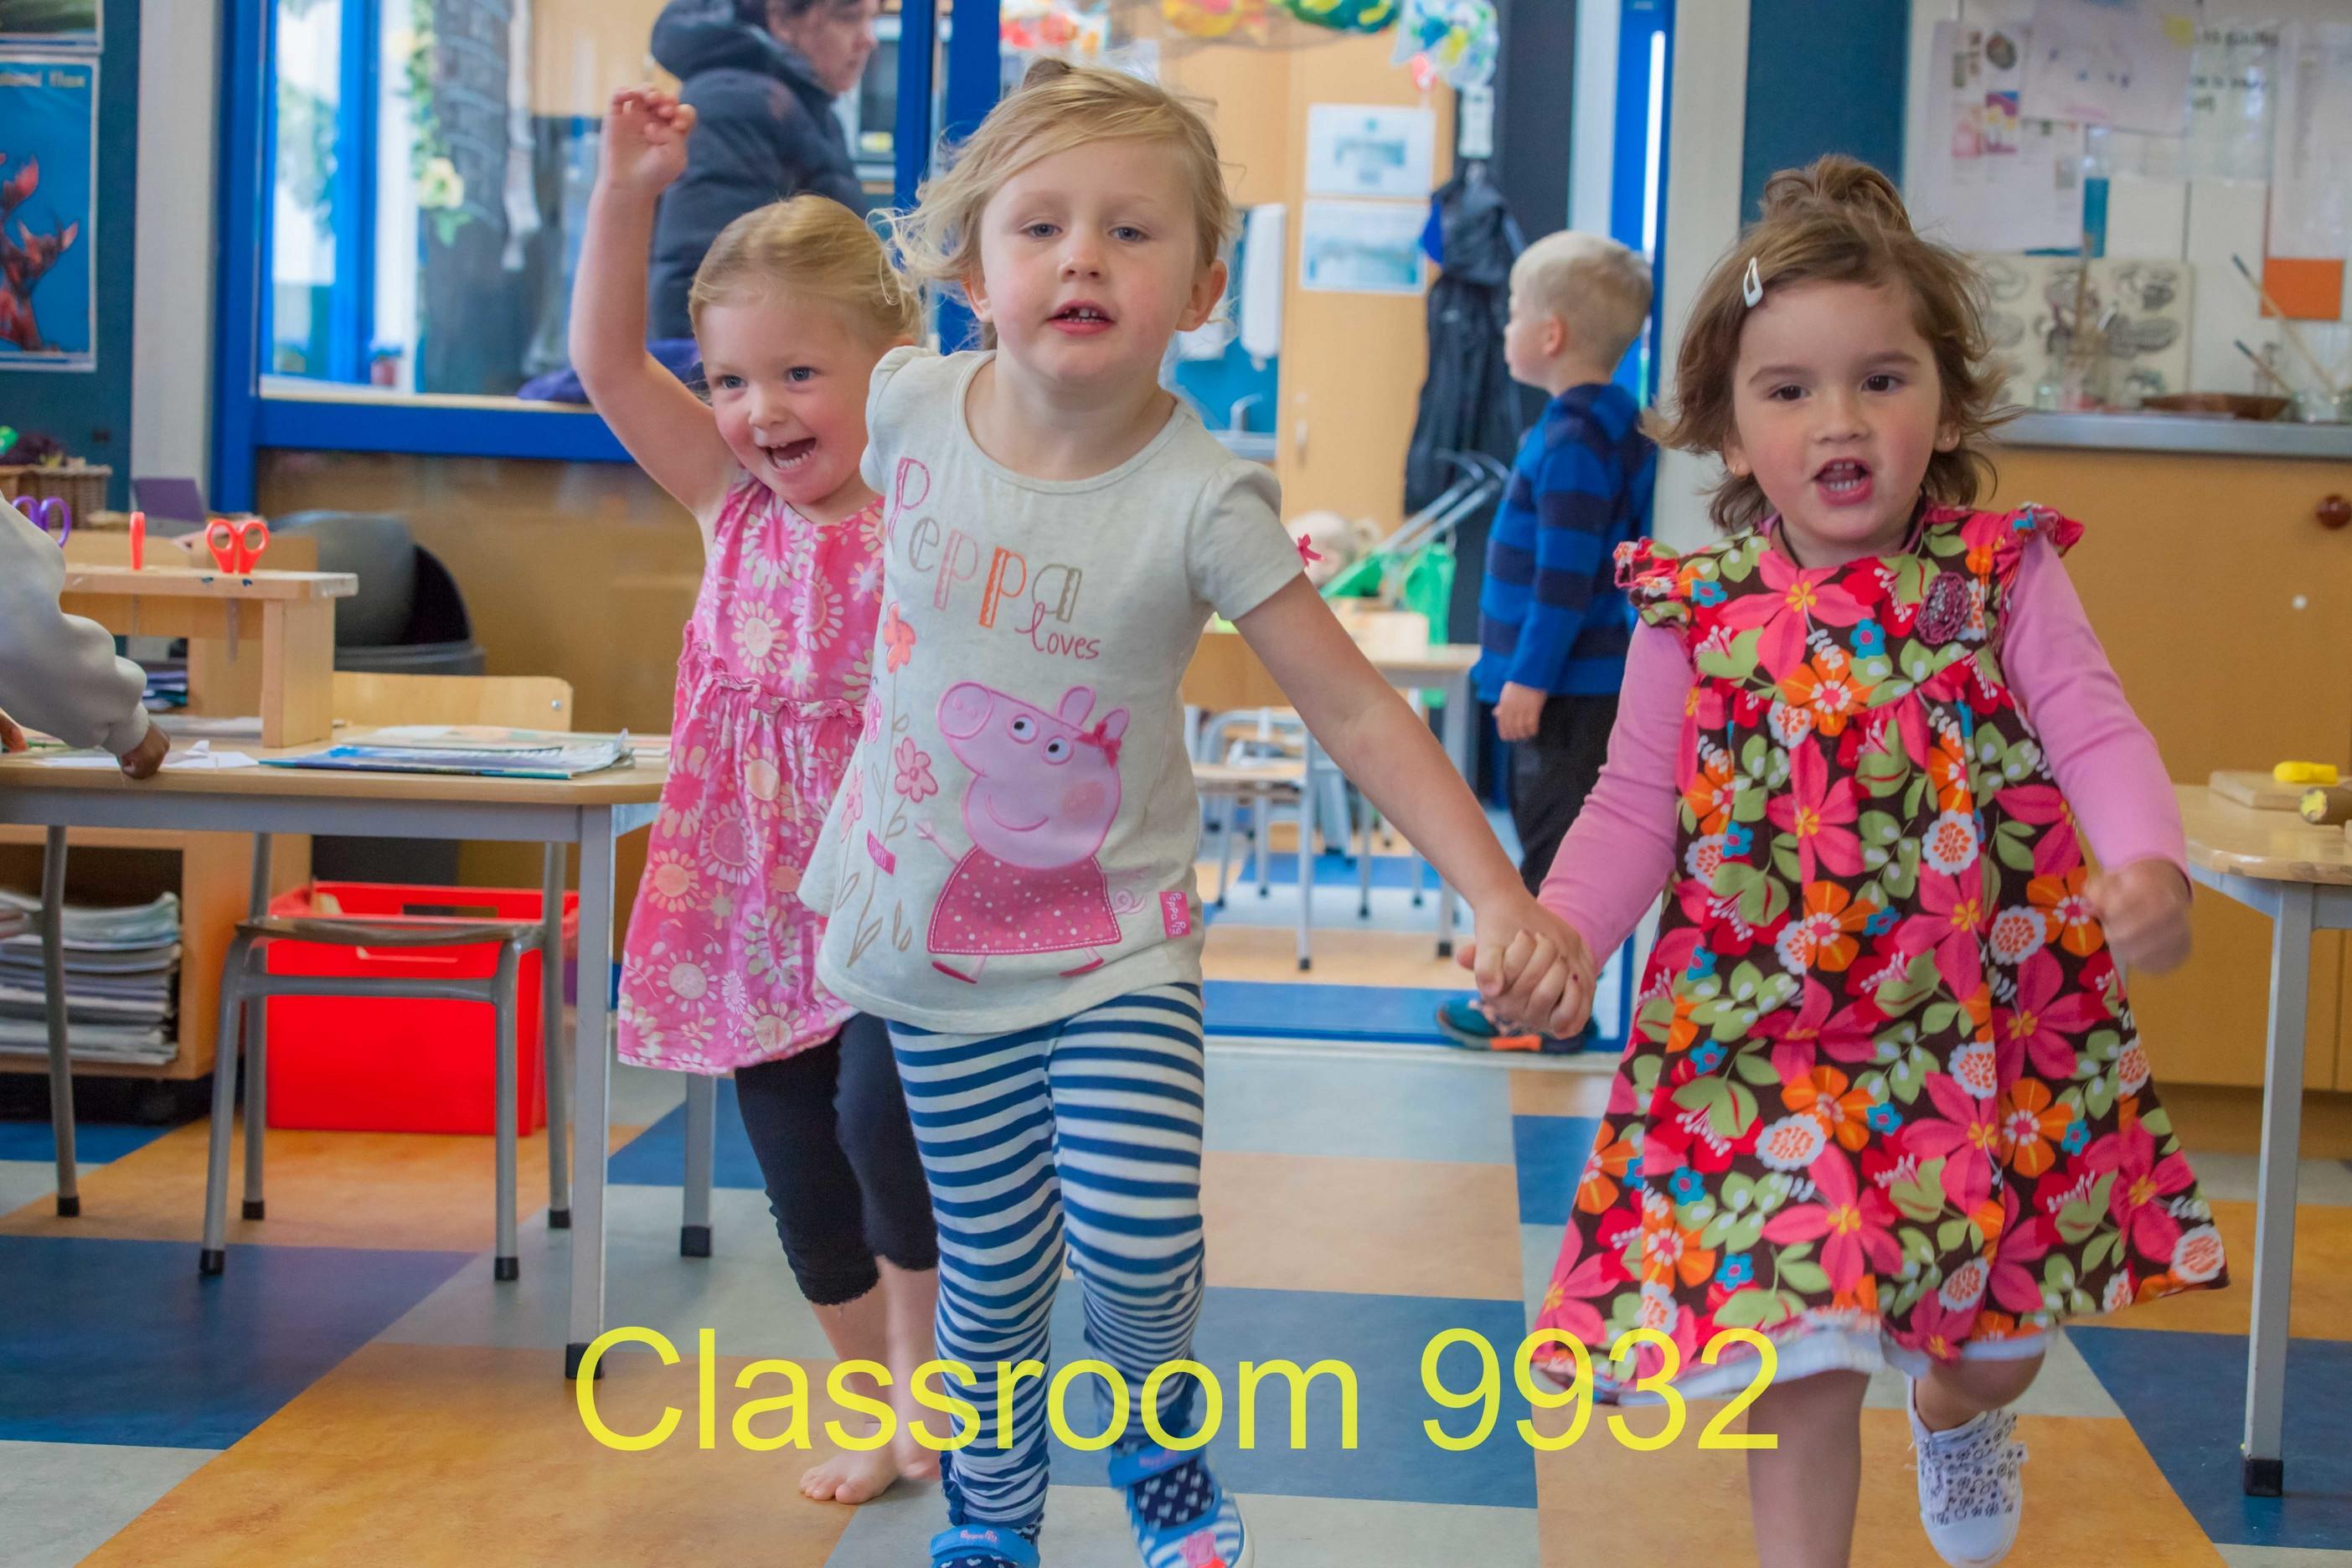 Classroom 9932